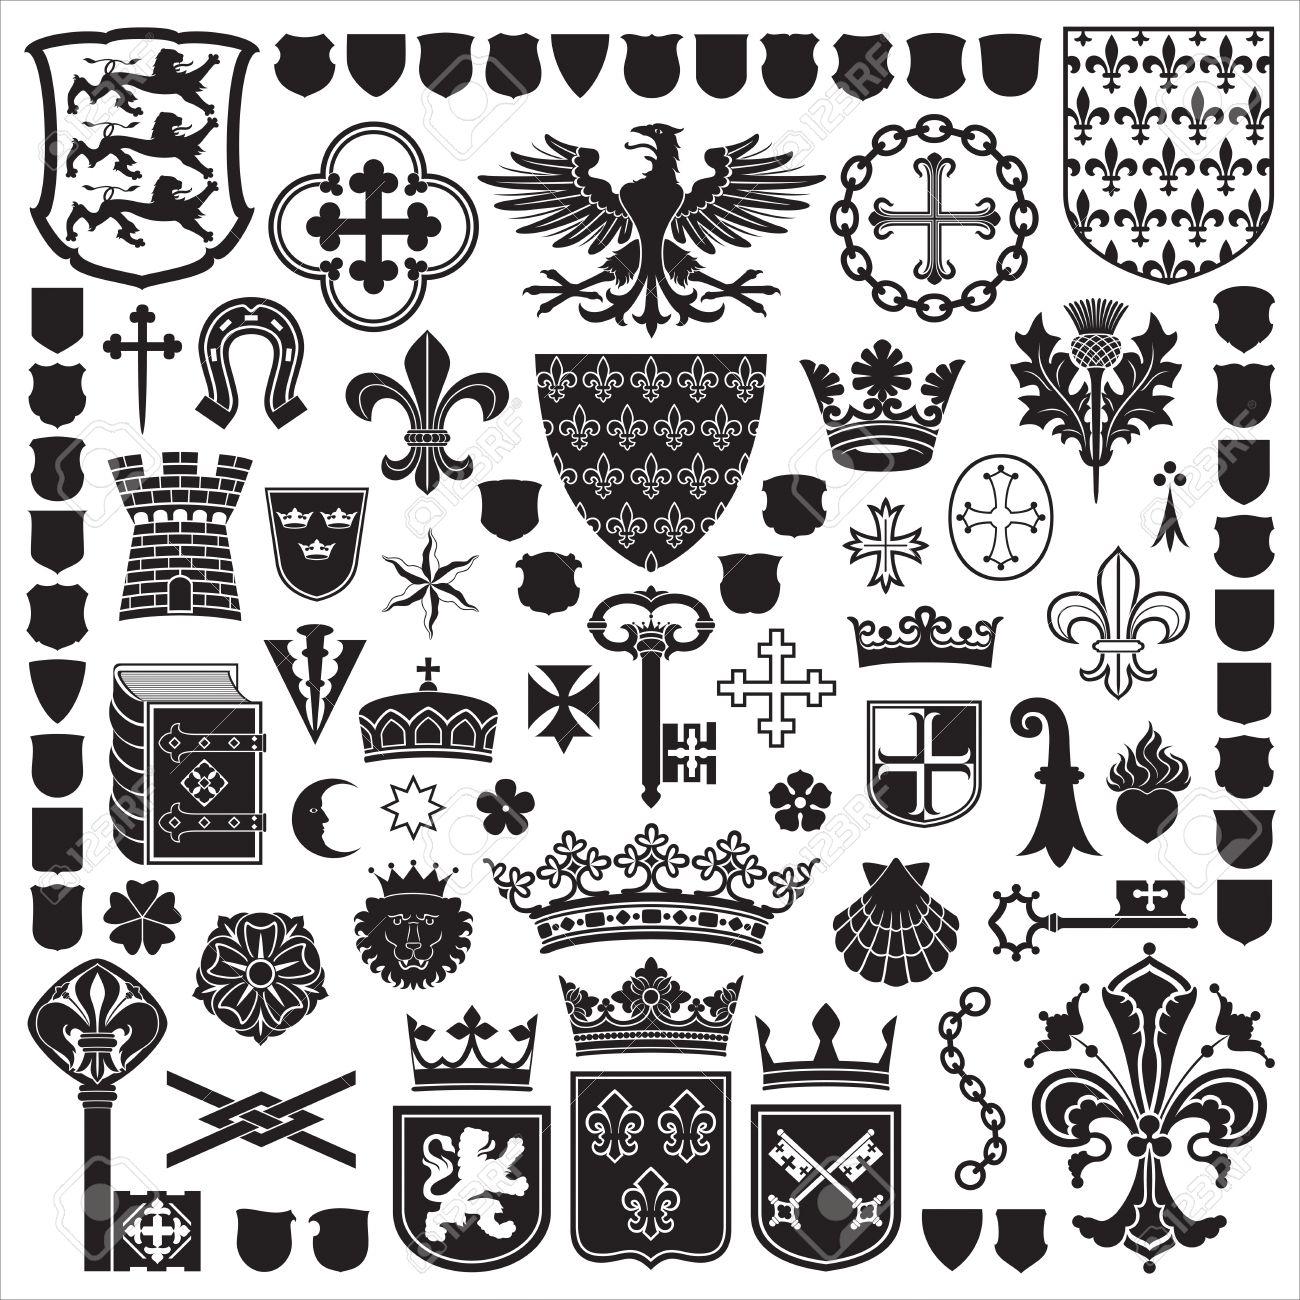 Heraldic Symbols And Decorations